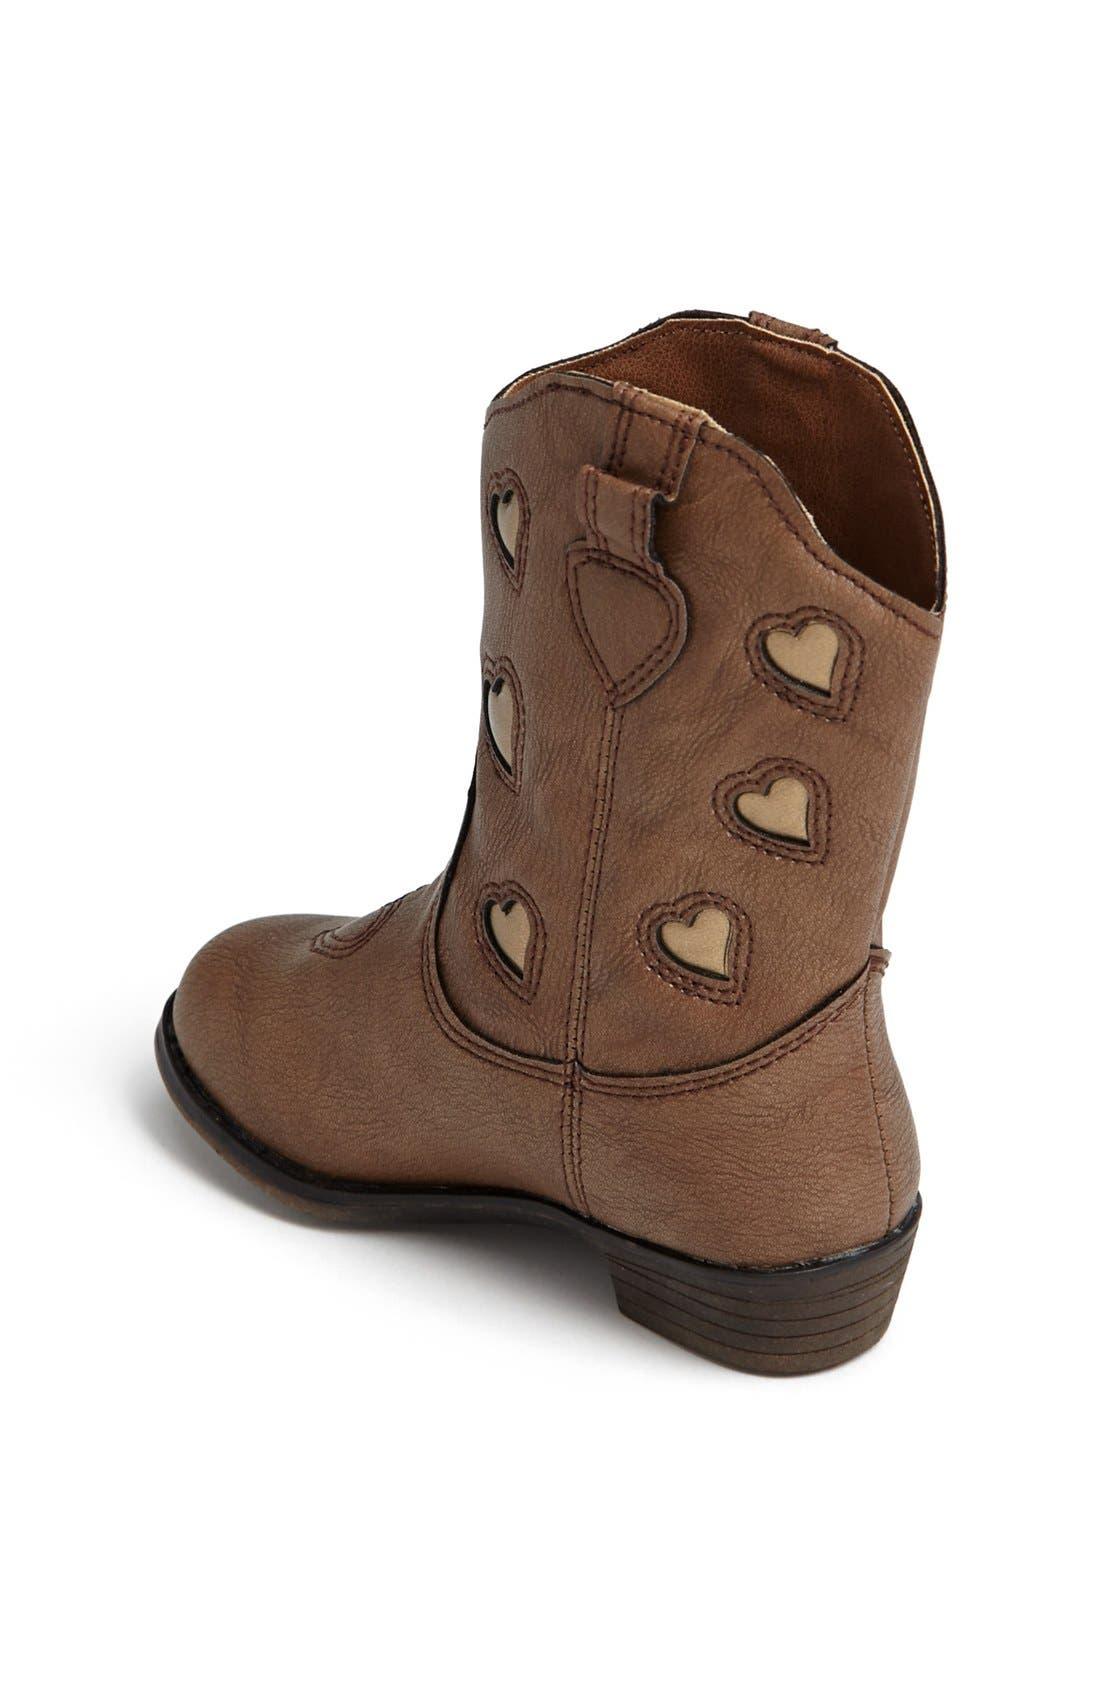 Alternate Image 2  - Jessica Simpson 'Kendelle' Boot (Walker & Toddler)